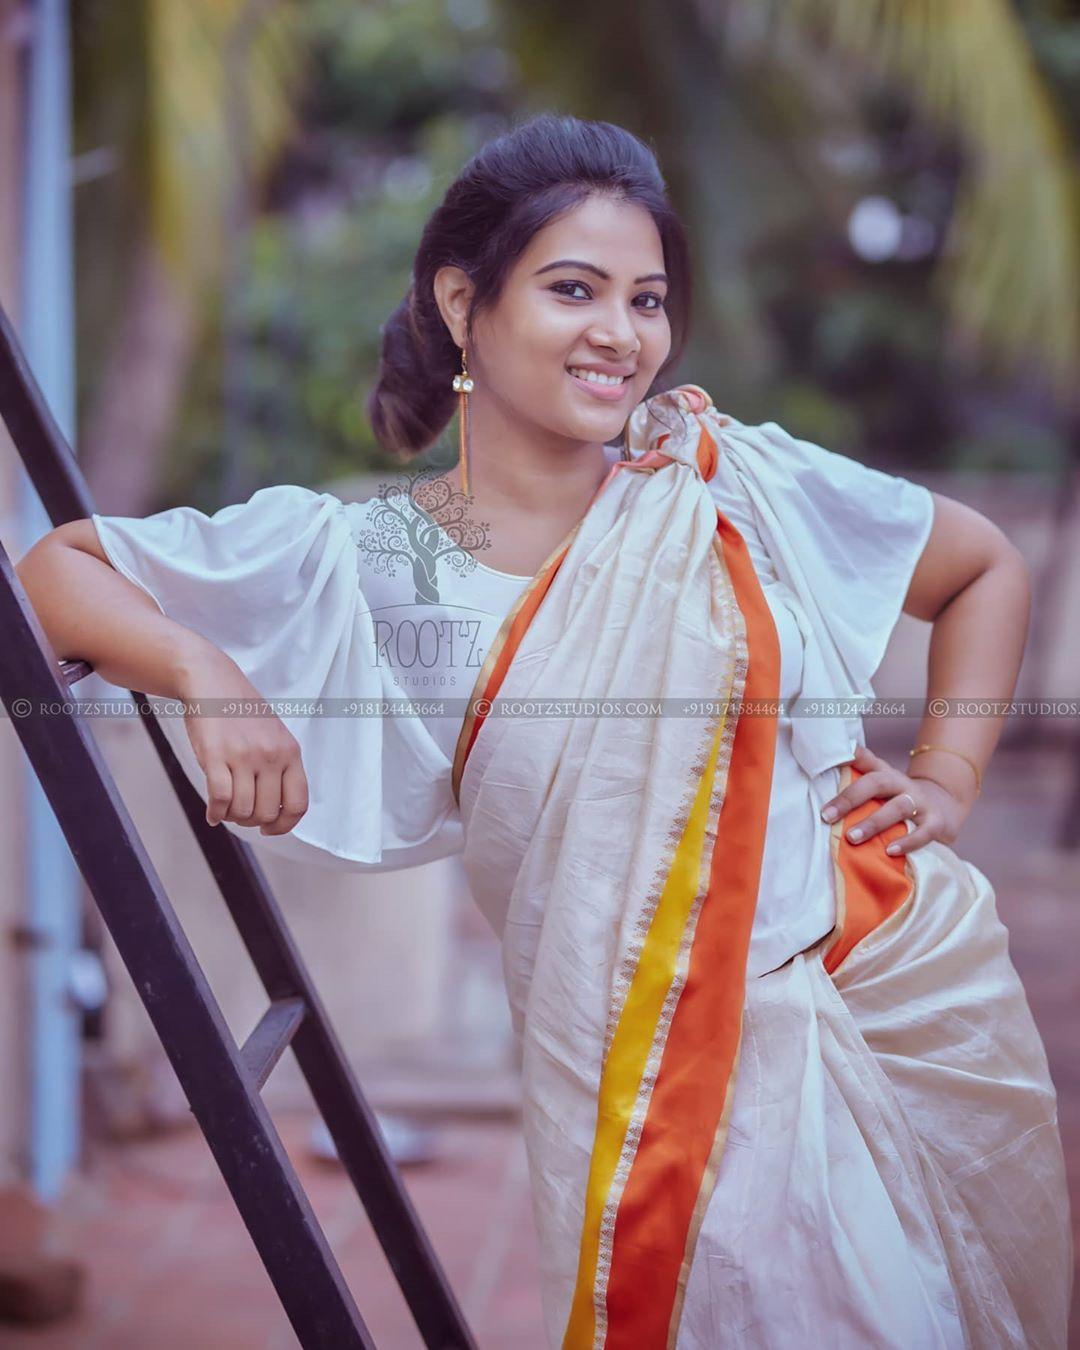 dhivya dhuraisamy homely saree photos (7)